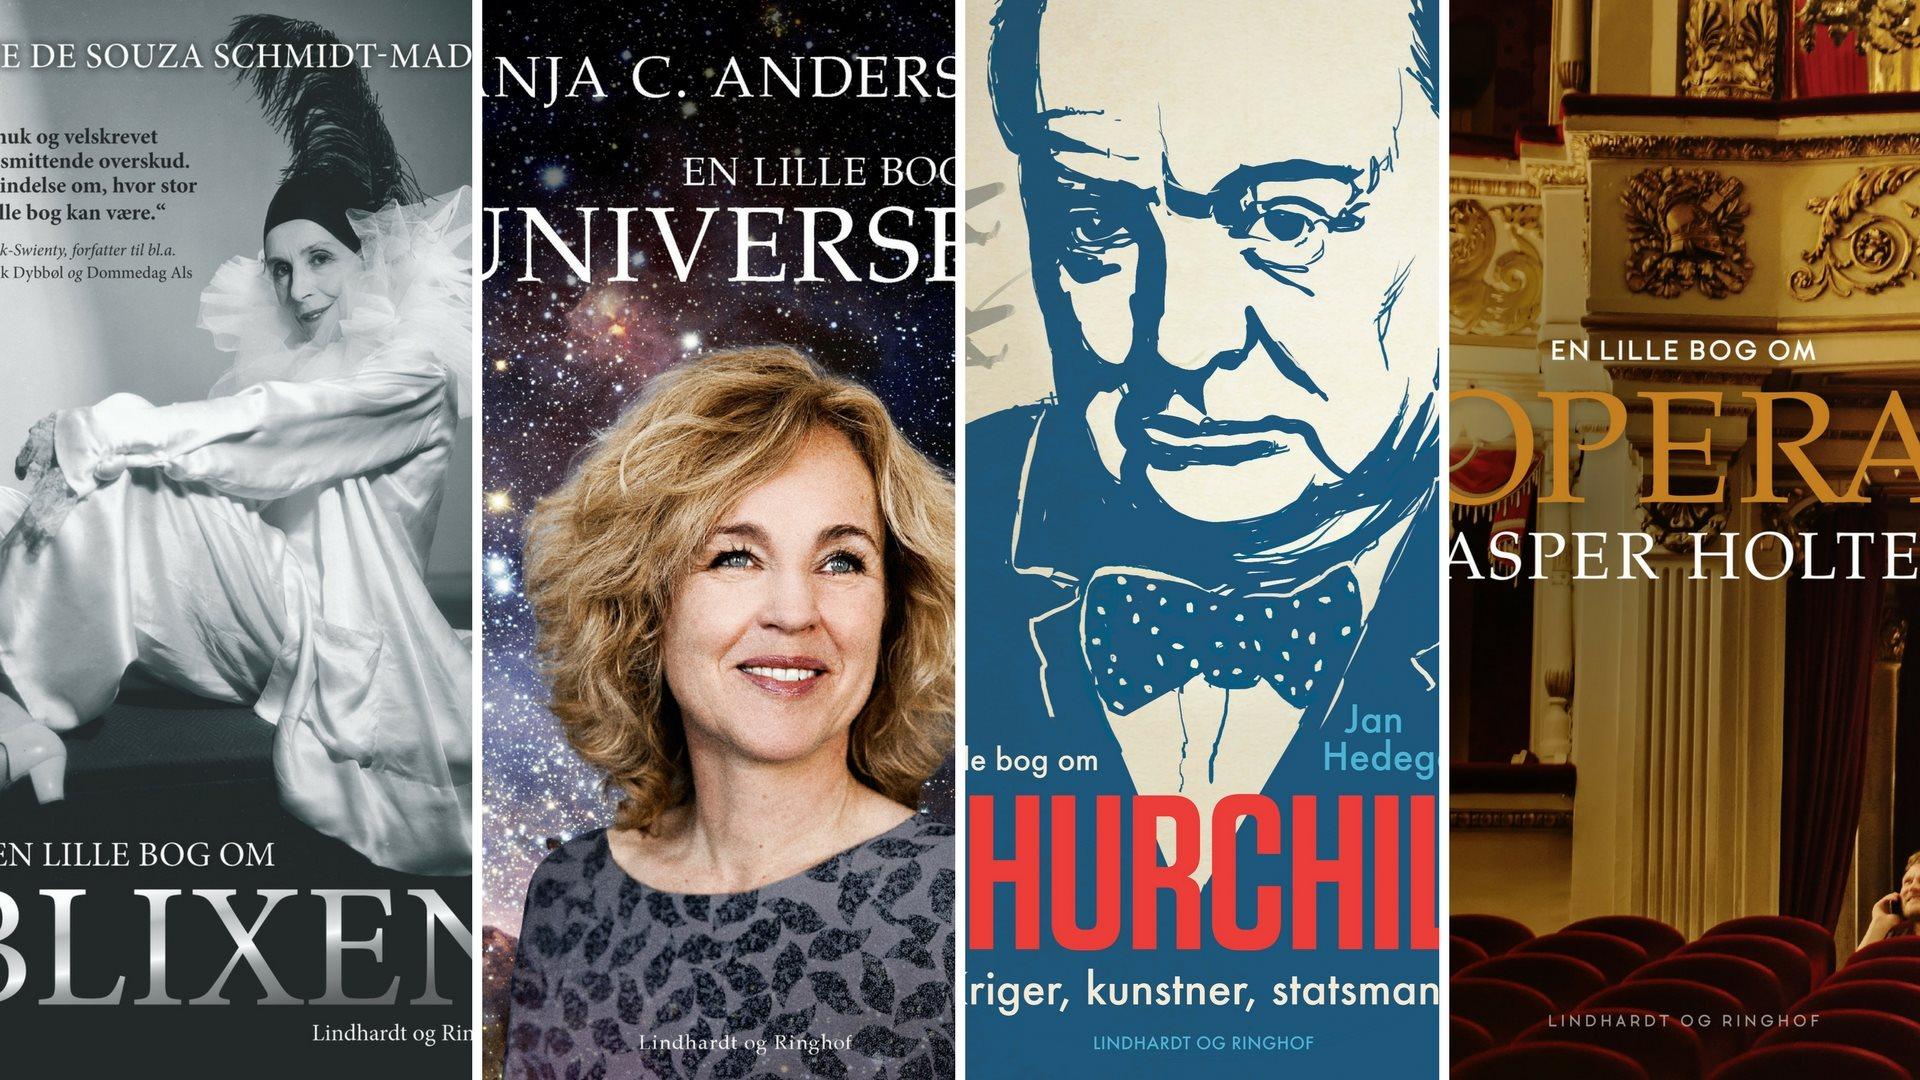 små bøger, lille bog om, blixen, universet, churchill, lindhardt og ringhof, opera, kasper holten, trend, tendens